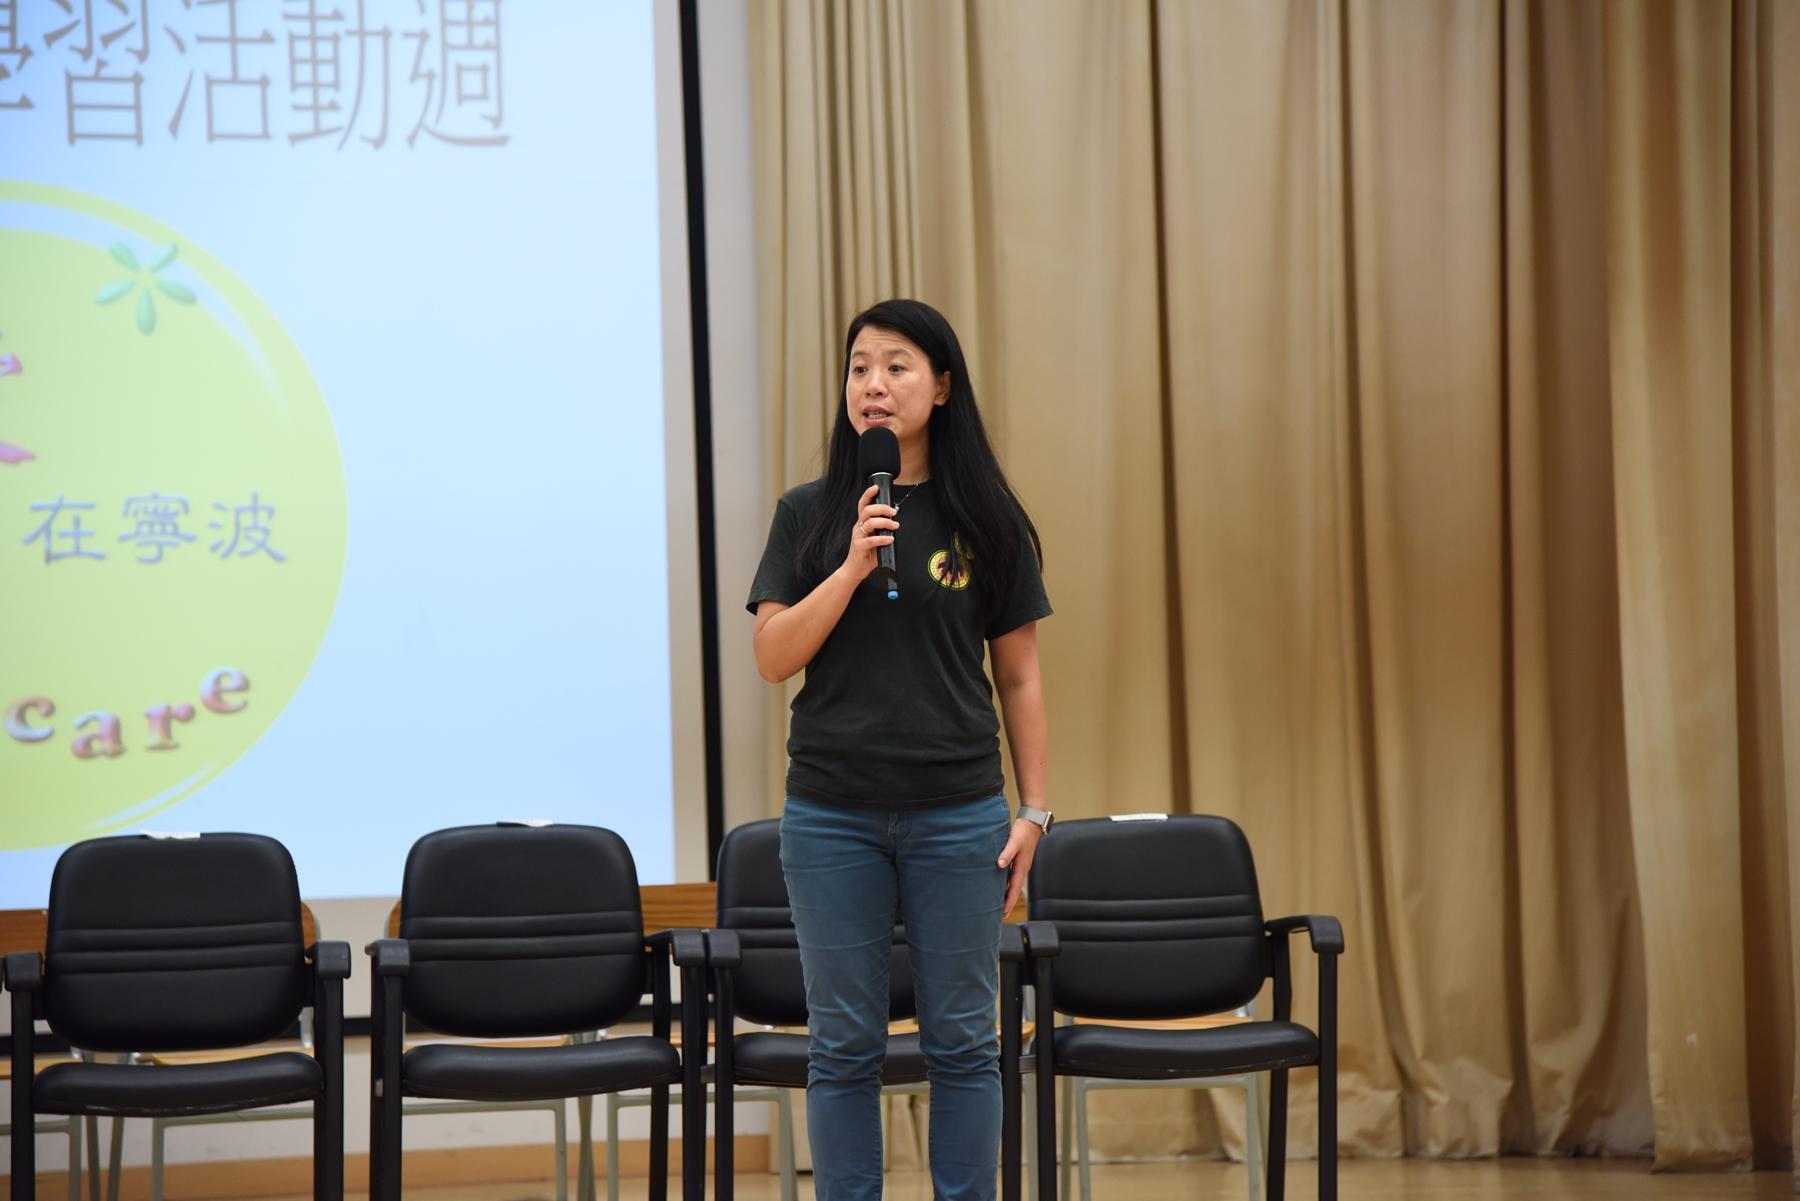 http://npc.edu.hk/sites/default/files/dsc_4865.jpg